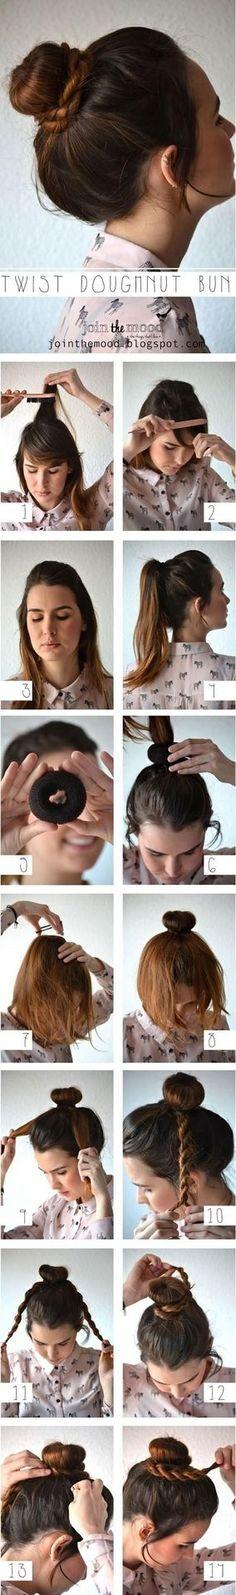 SHORT/THIN #hairstyles